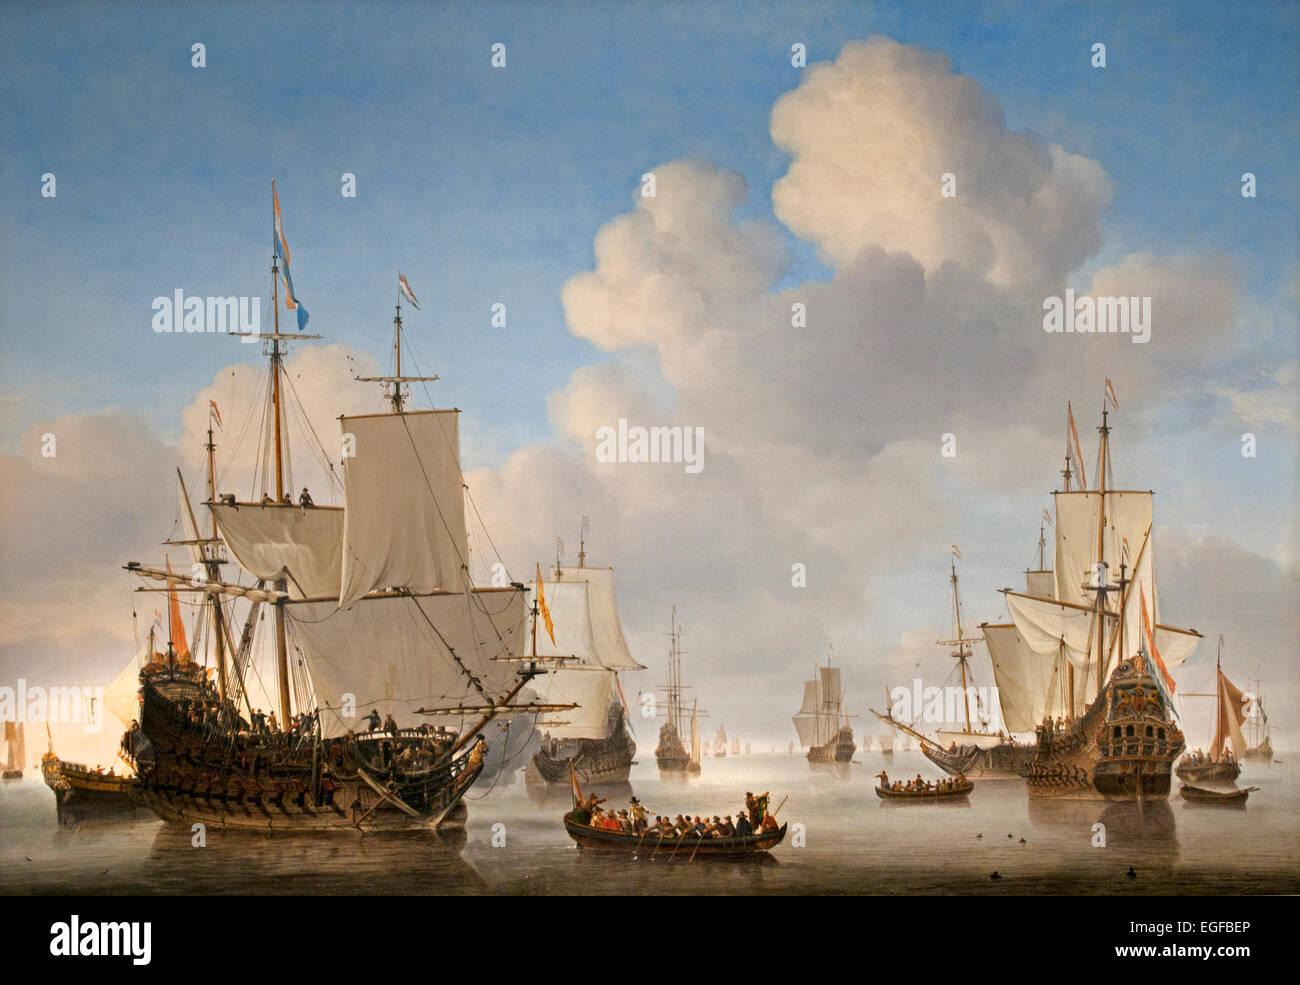 Dutch Ships on a calm Sea 1665 Willem van de Velde 1  1611-1693 Dutch Netherlands - Stock Image